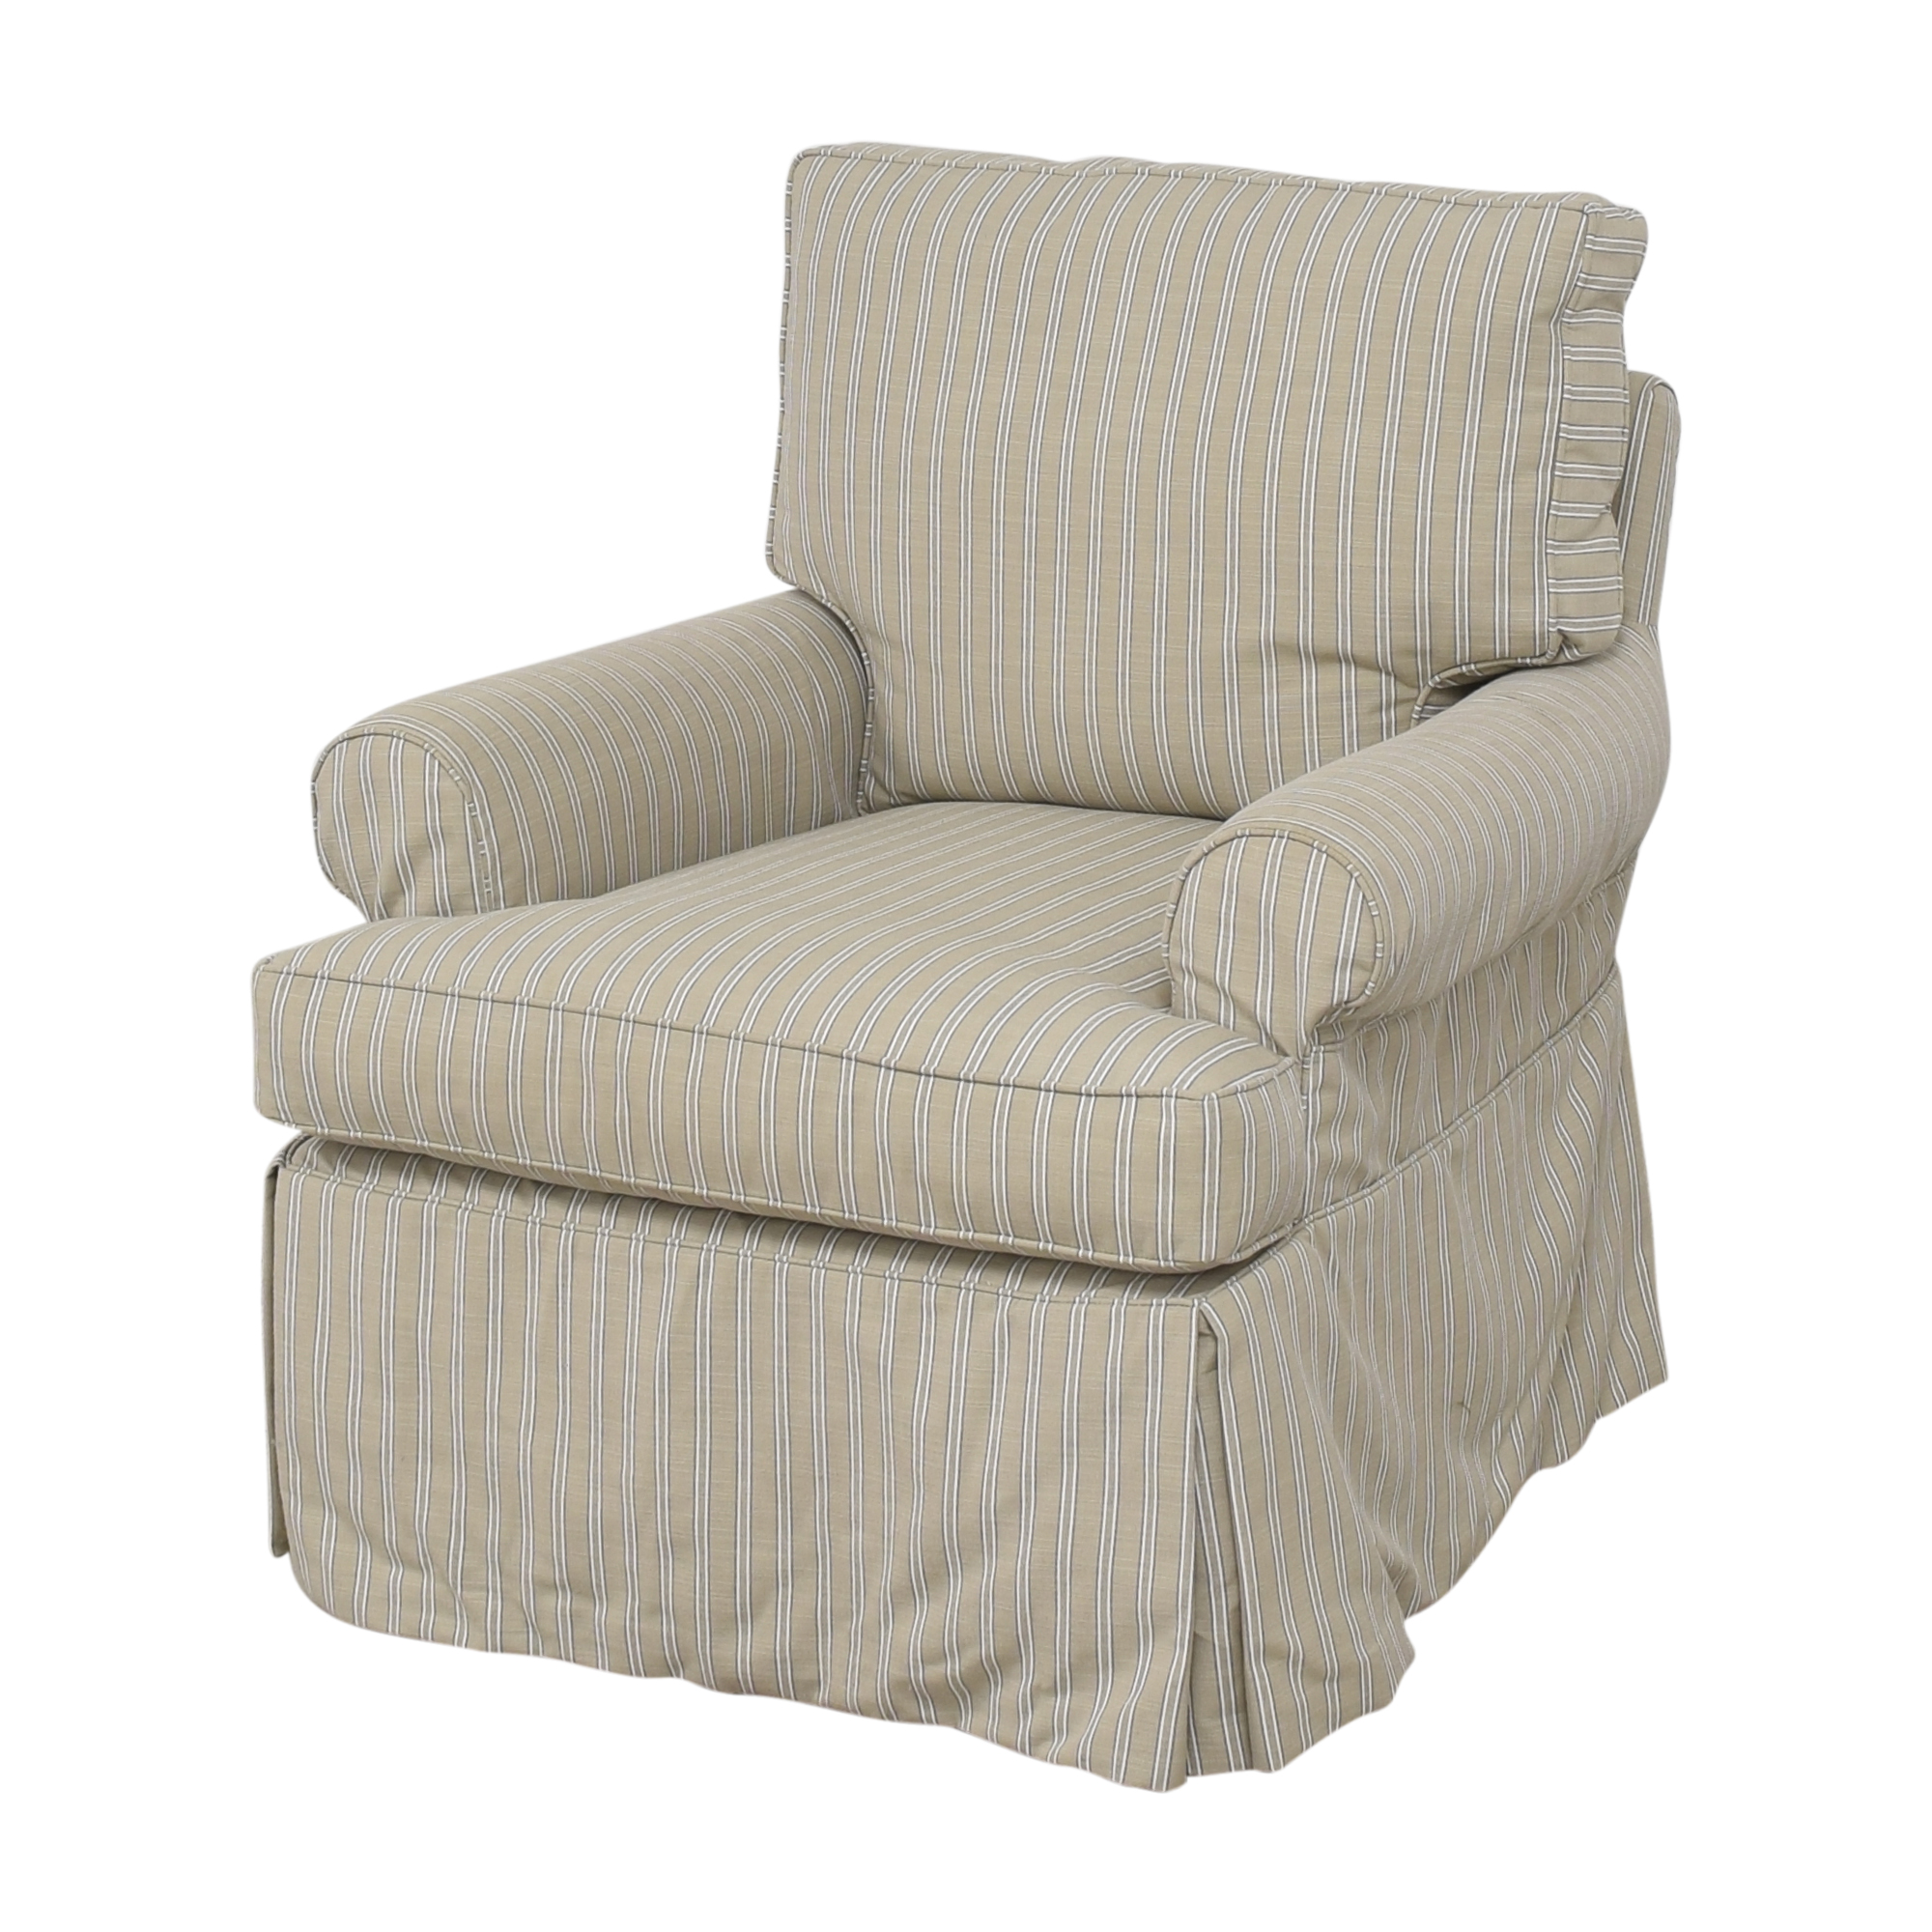 buy Restoration Hardware Skirted Glider  Restoration Hardware Chairs